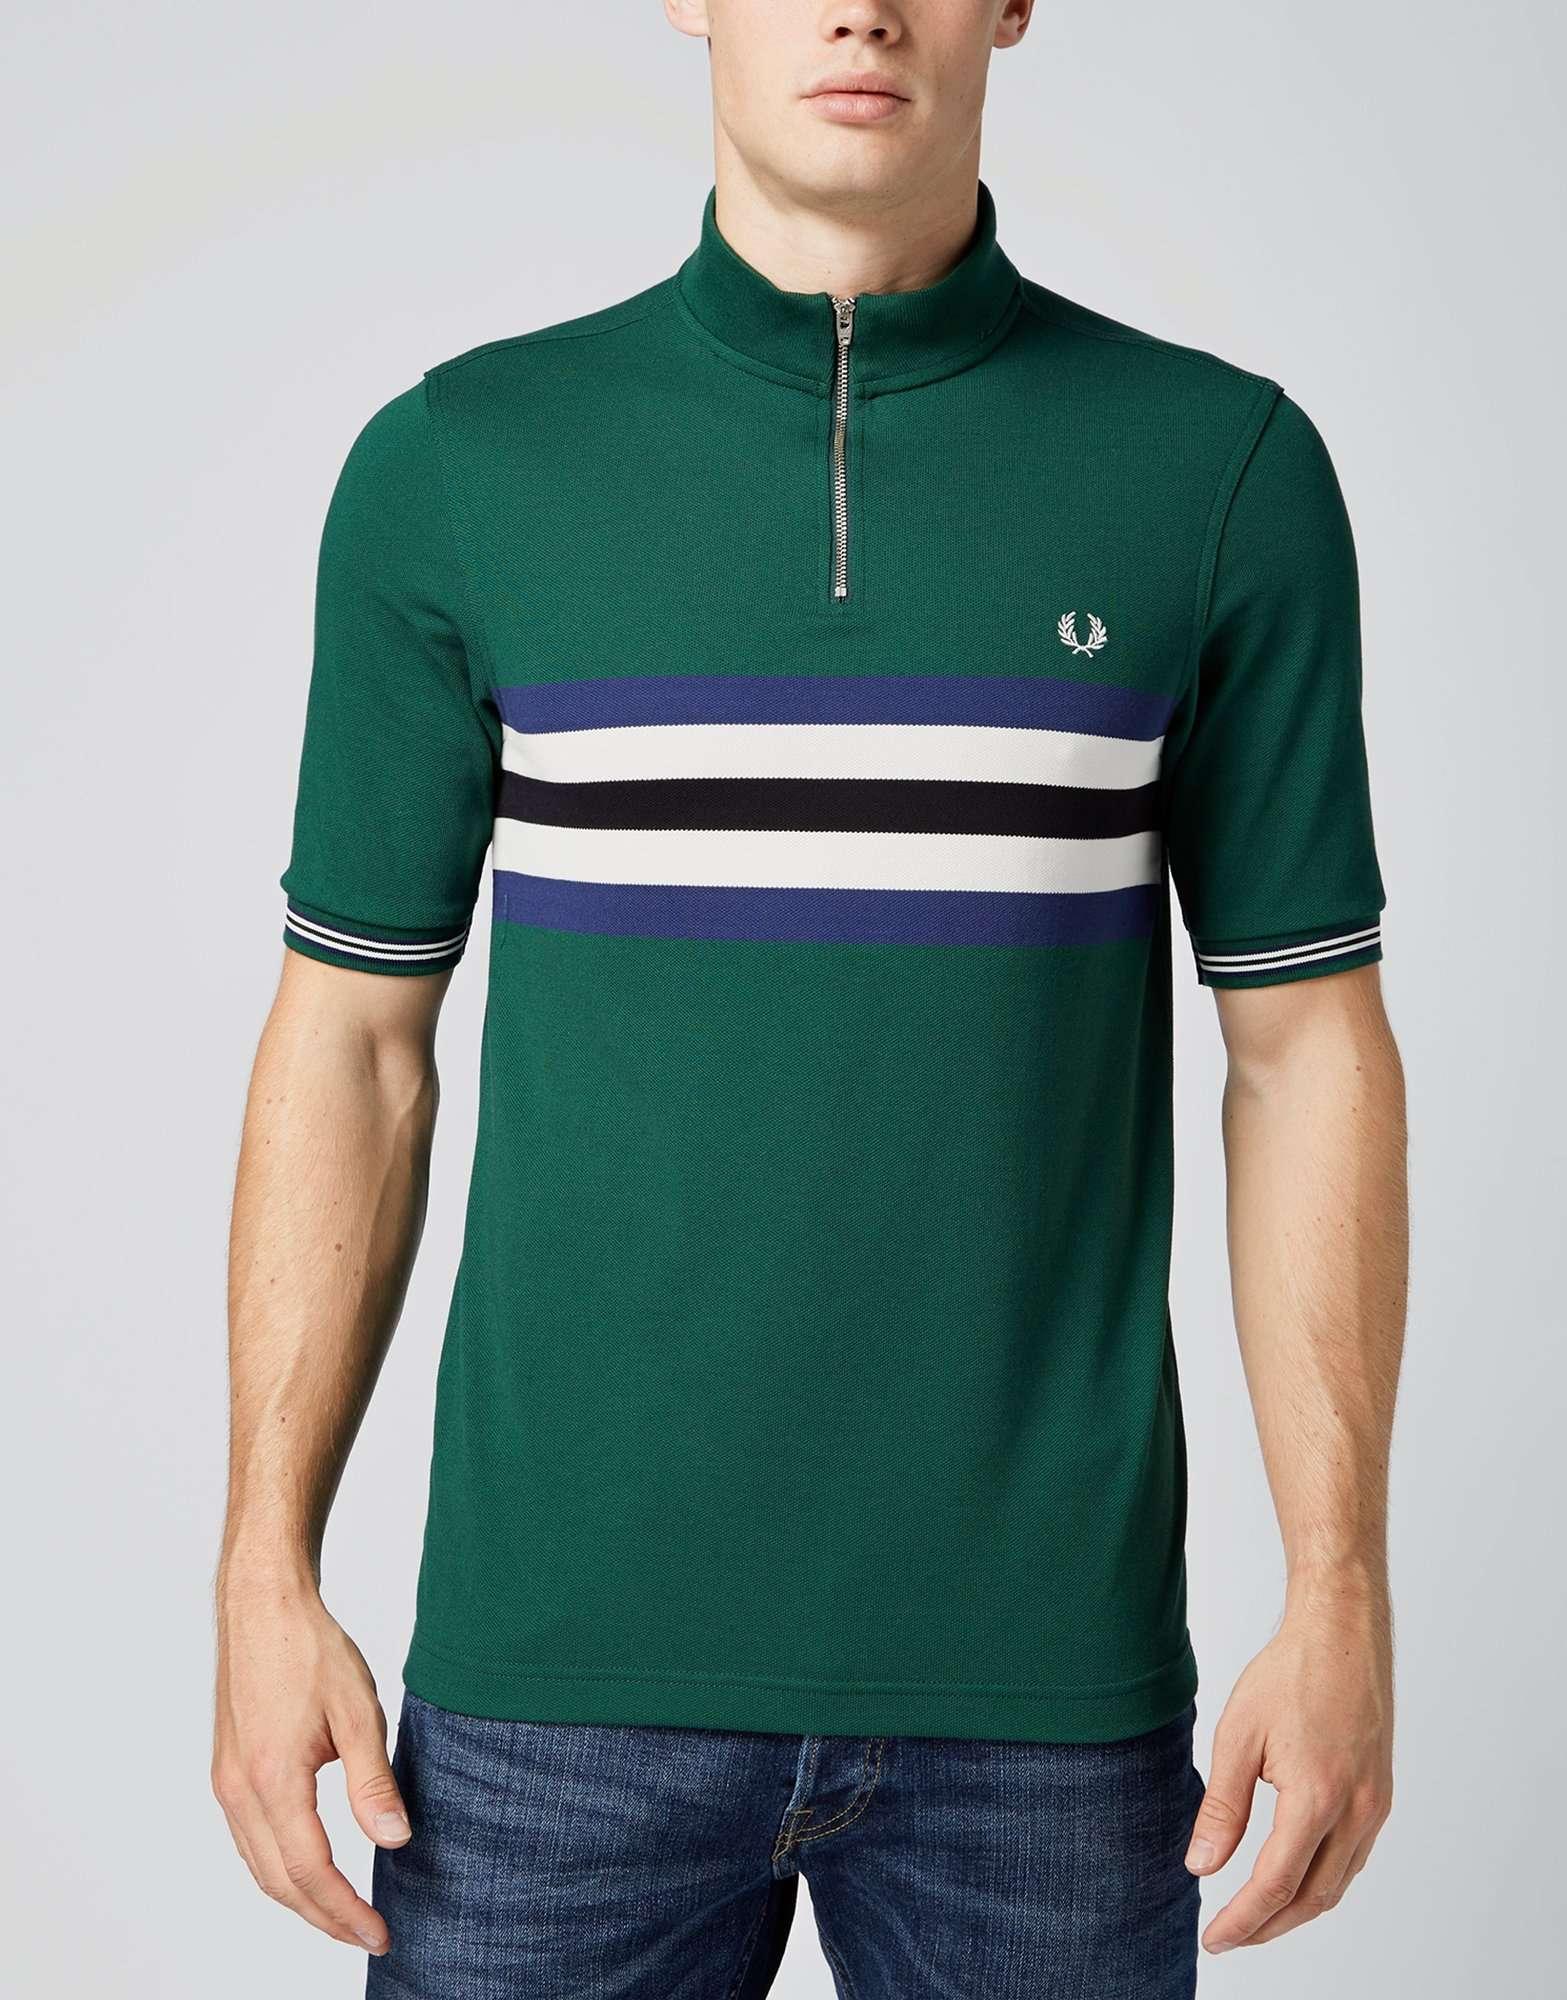 Fred Perry Bradley Wiggins Cycling Polo Shirt  35388508a